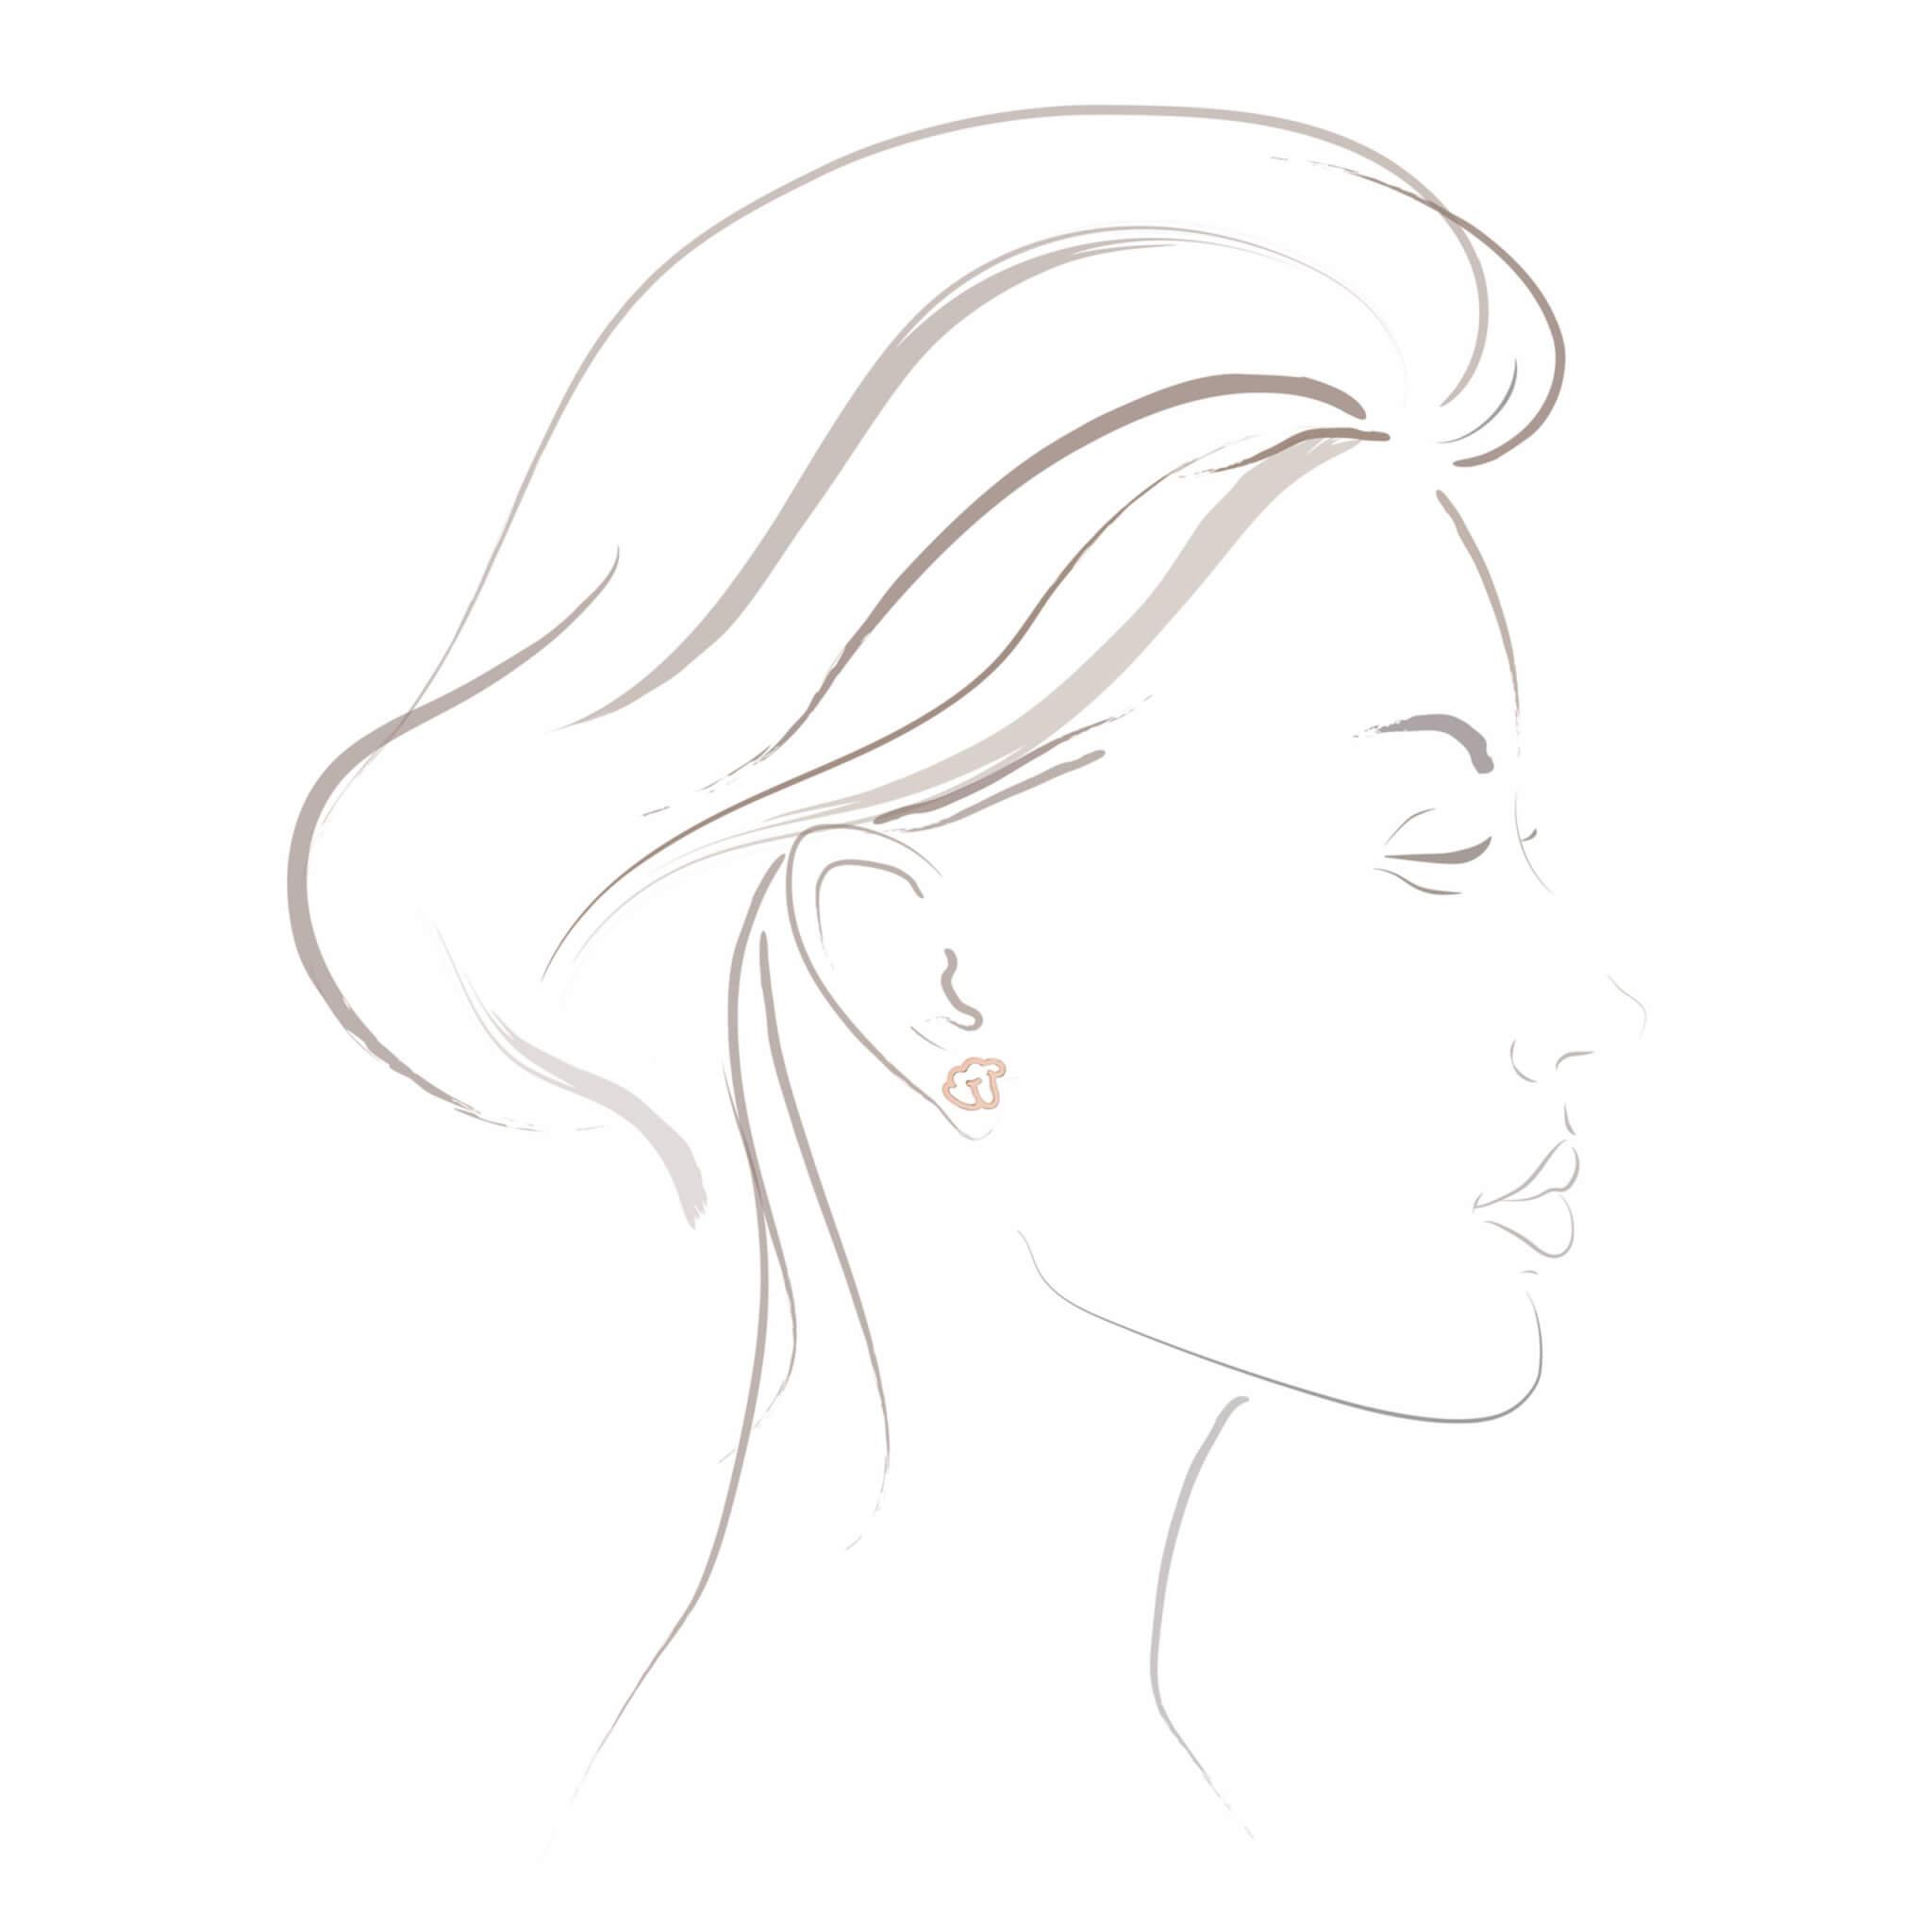 Empreinte boucle d'oreilles or blanc